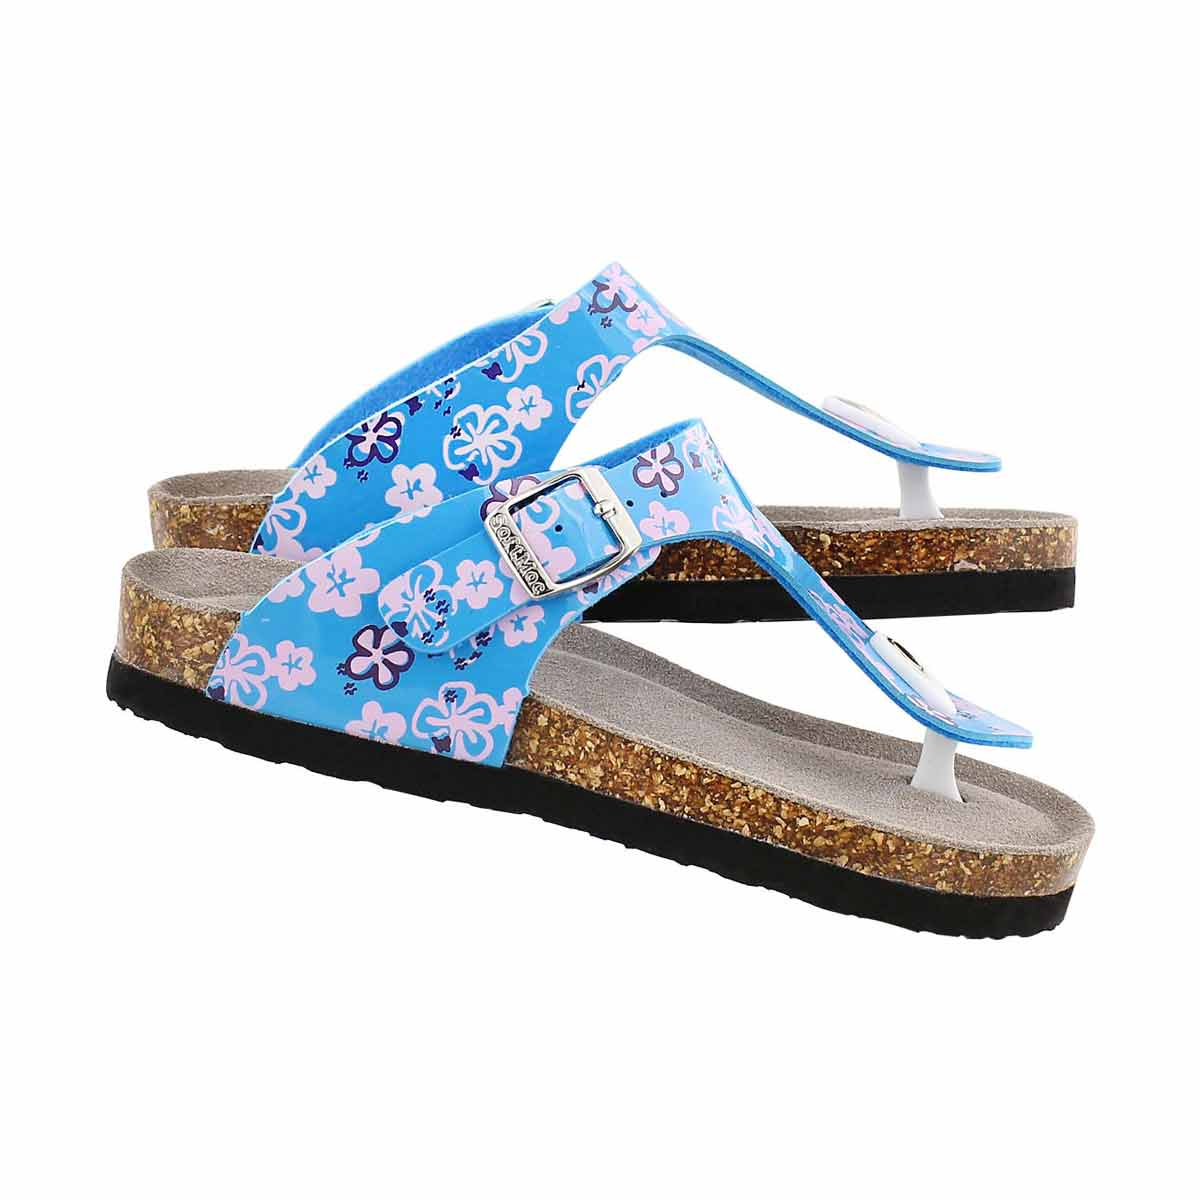 Sandale tong Alison2, bleu, filles